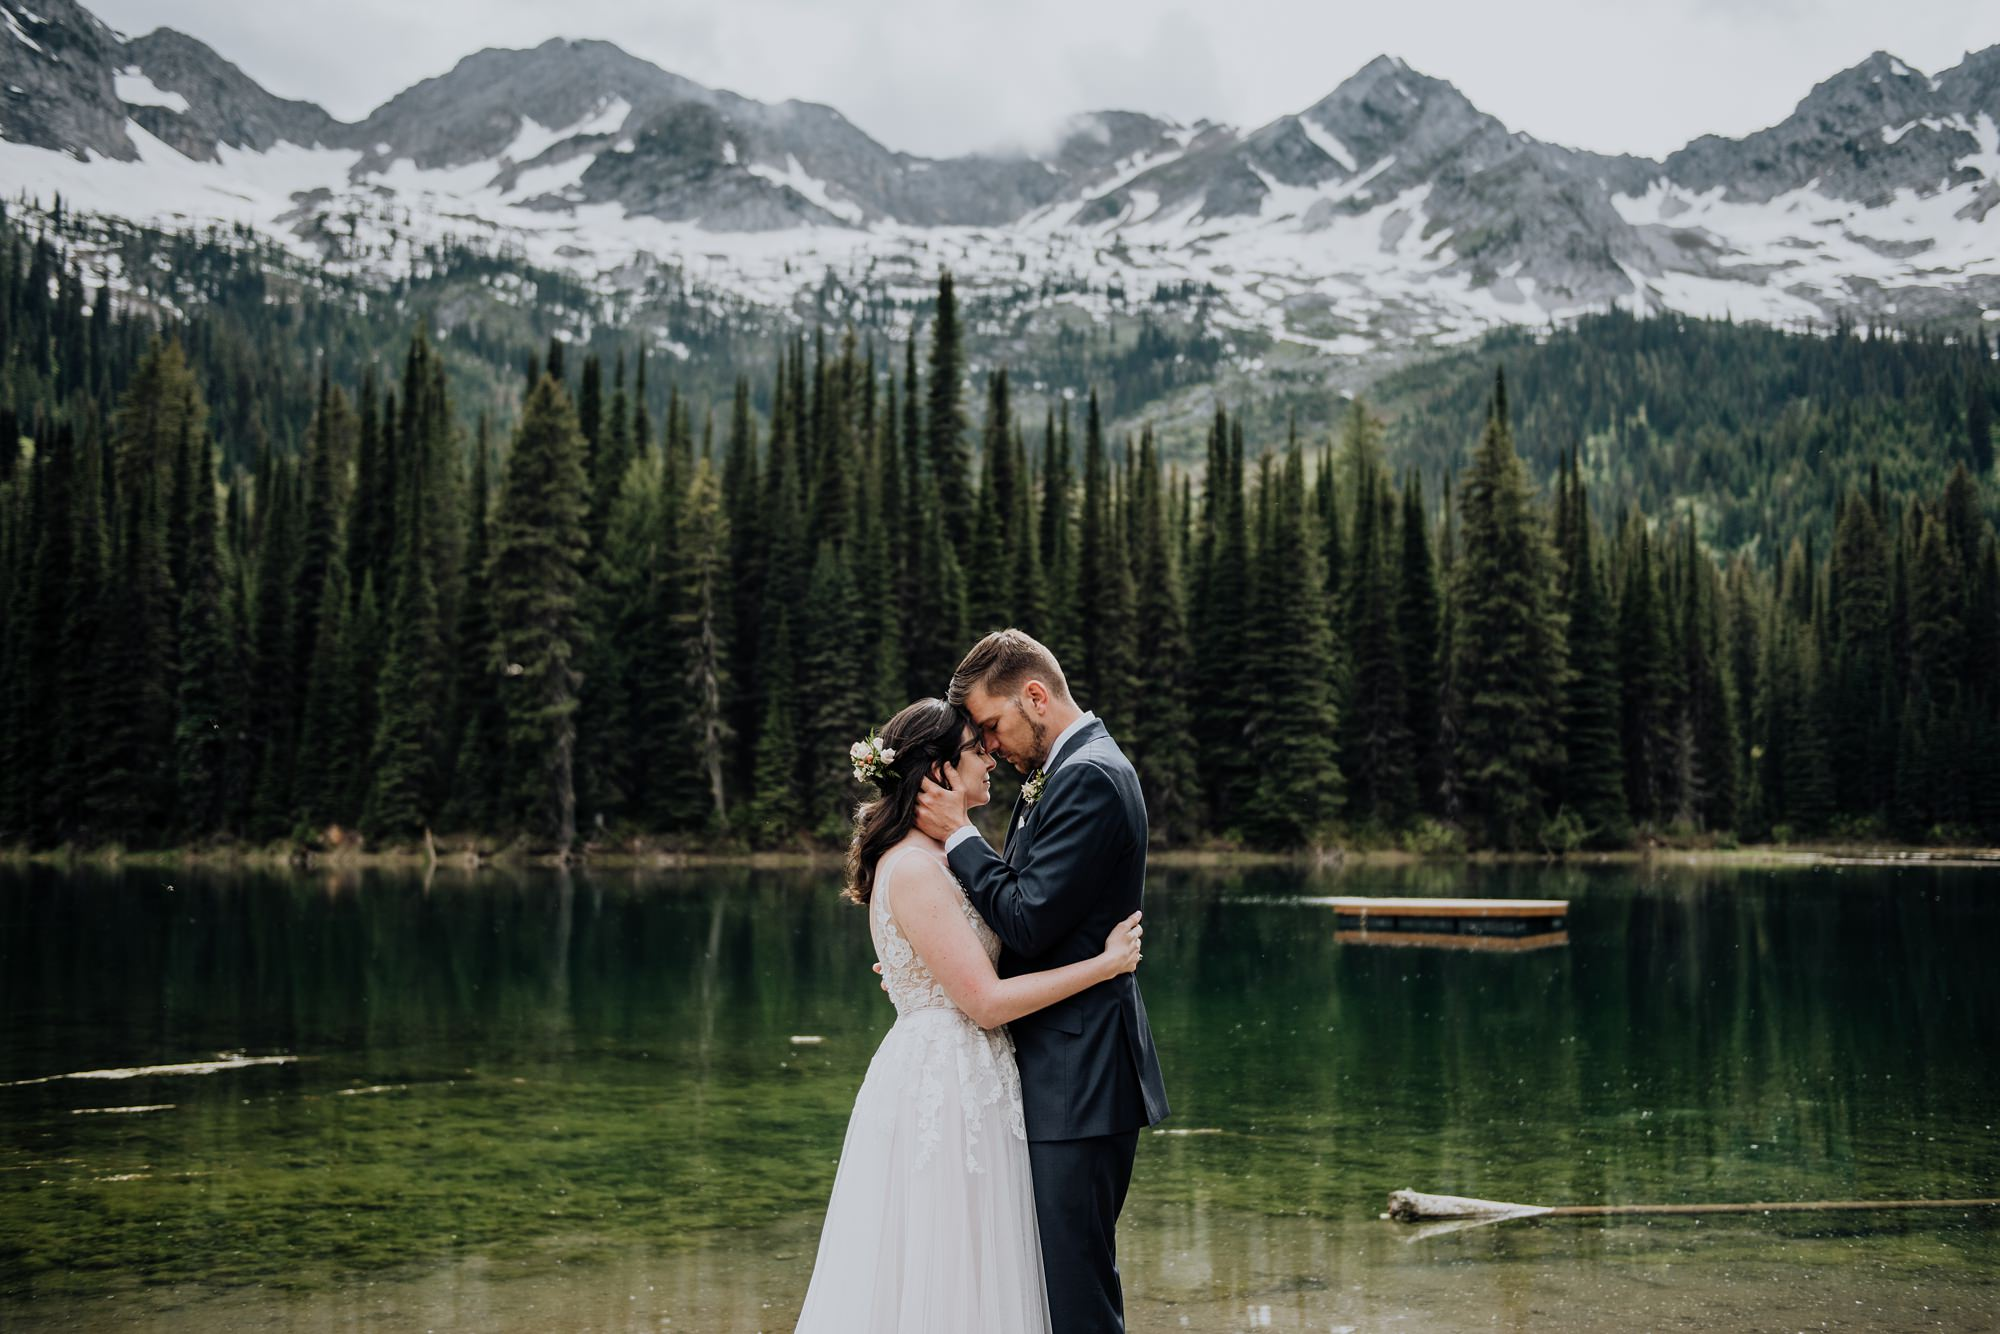 bride and groom at lake during classic, modern mountain wedding at island lake lodge wedding captured by calgary wedding photographer